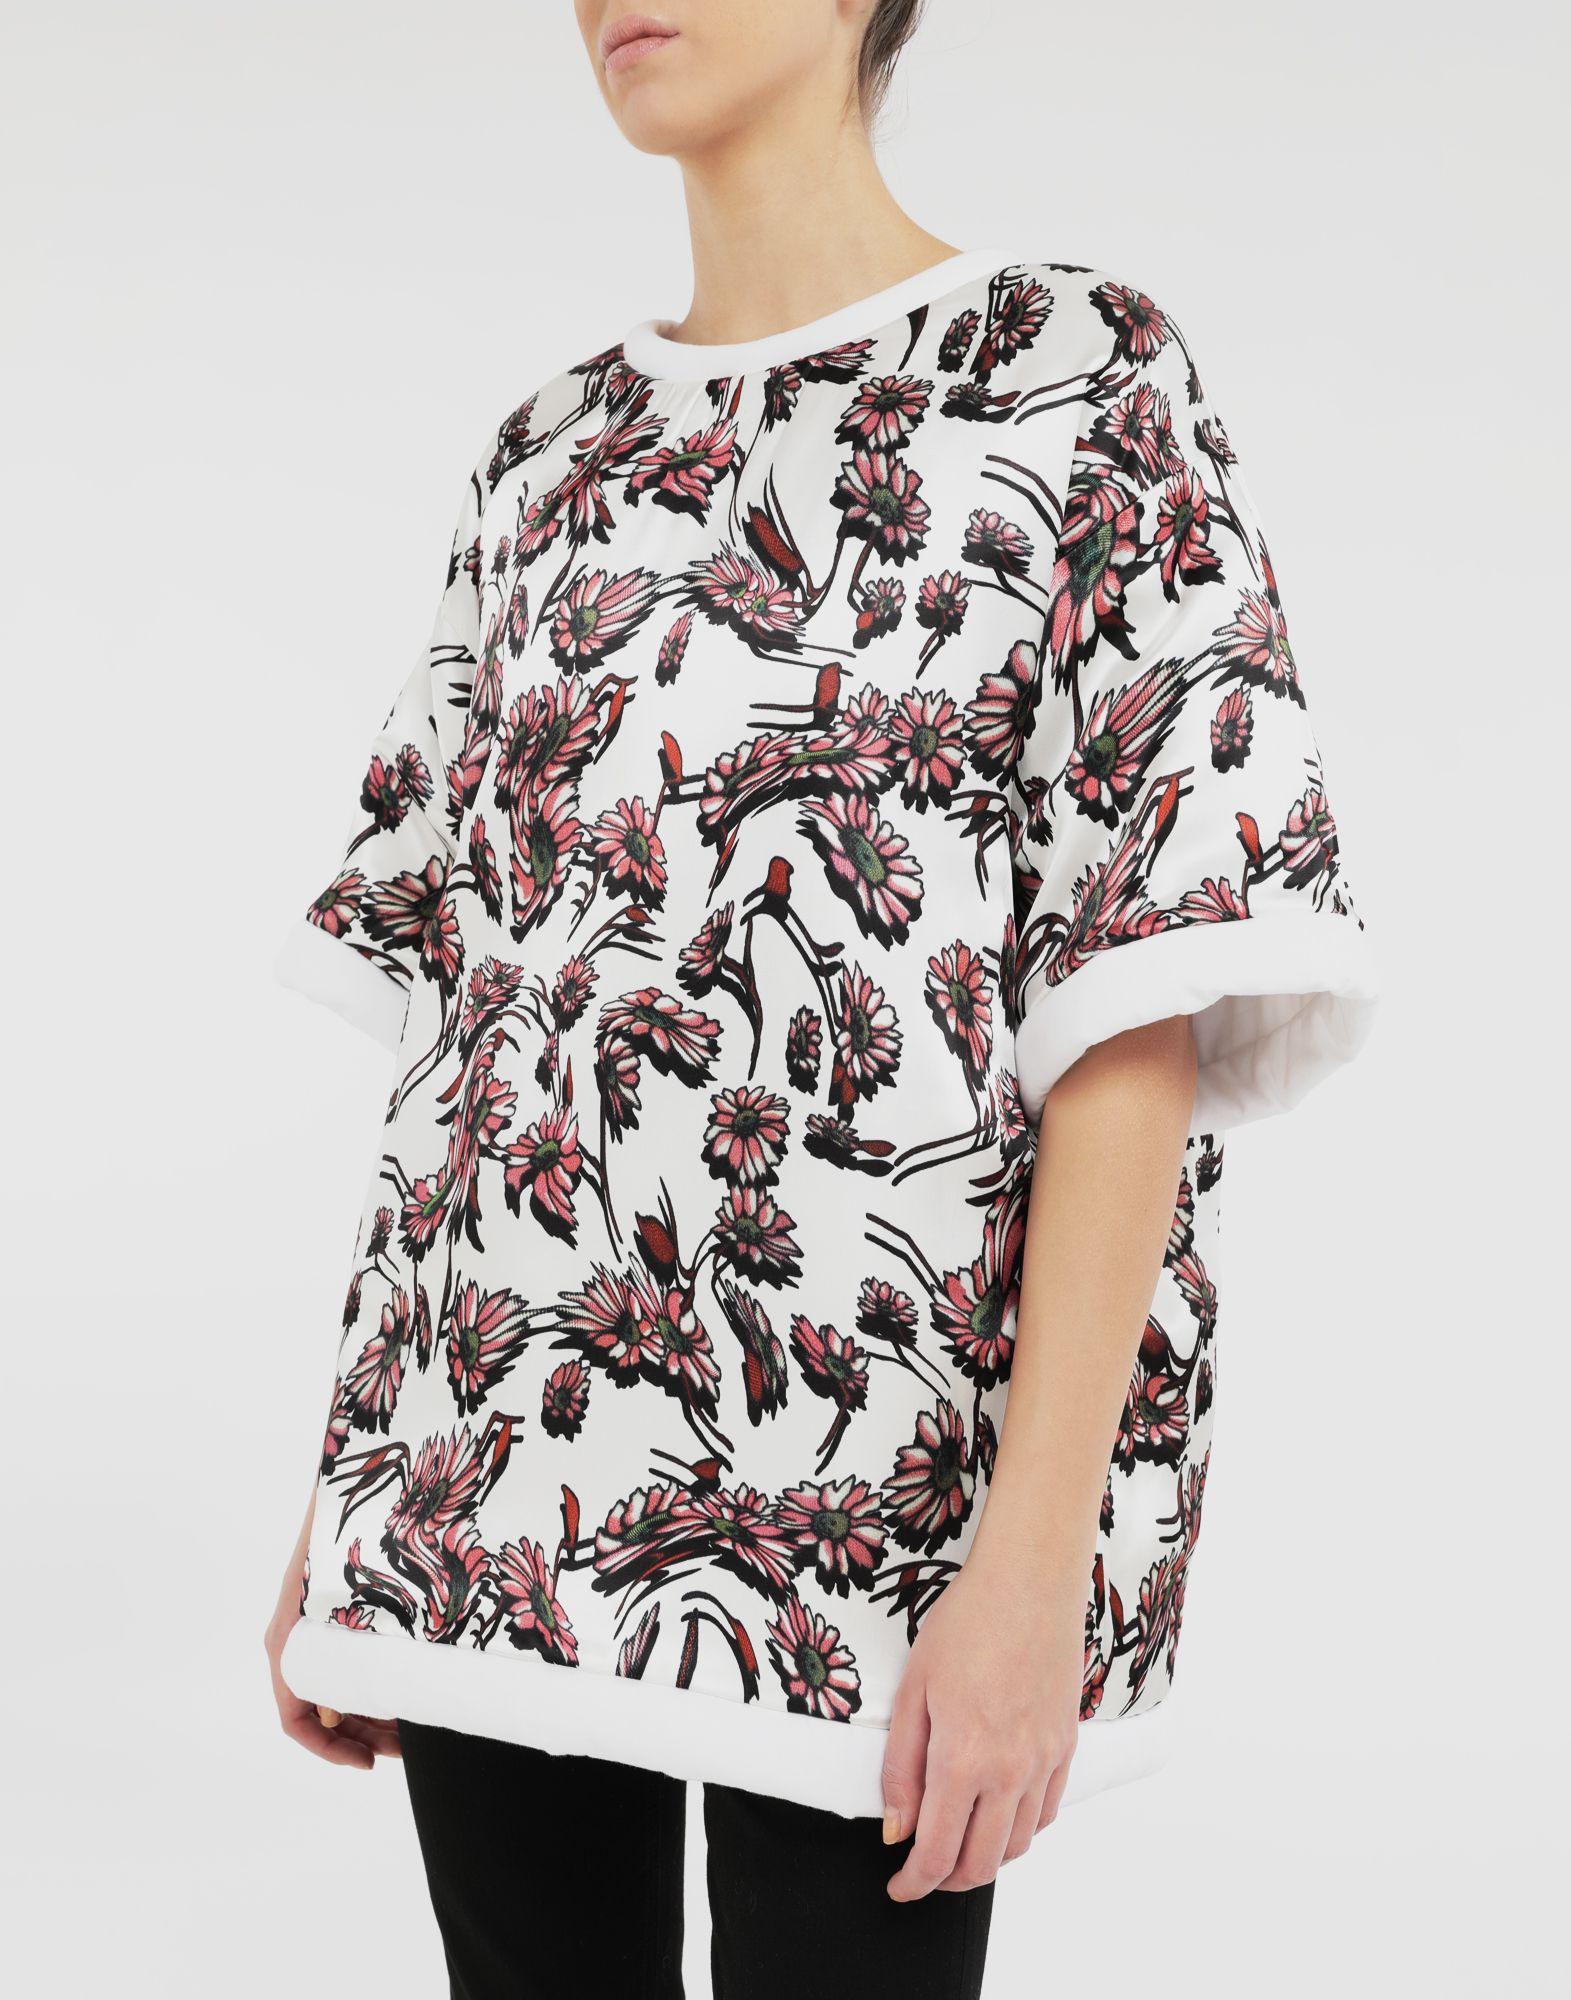 MM6 MAISON MARGIELA Wendbares Logo-T-Shirt Kurzärmliges T-Shirt Dame r